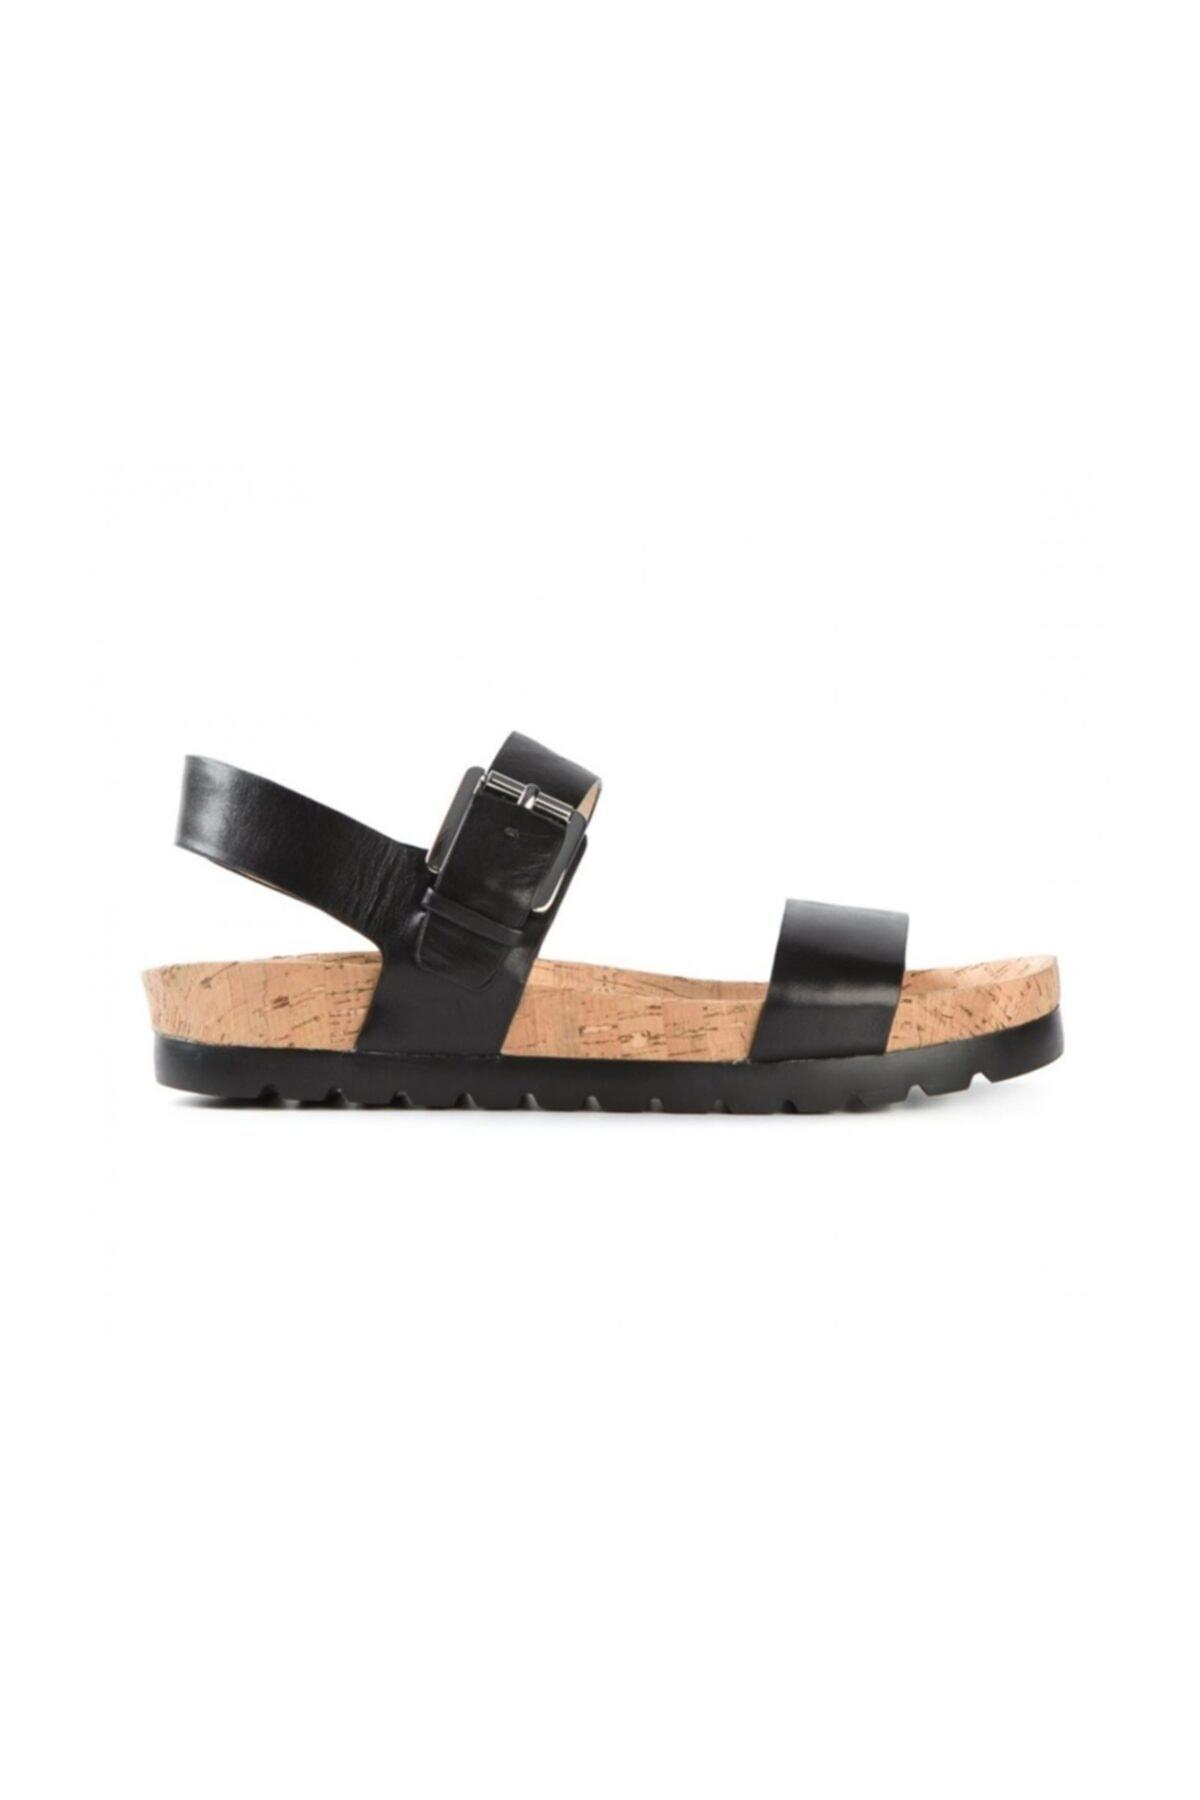 Michael Kors Judie Kadın  Sandalet Siyah 40s5jufaıl 2